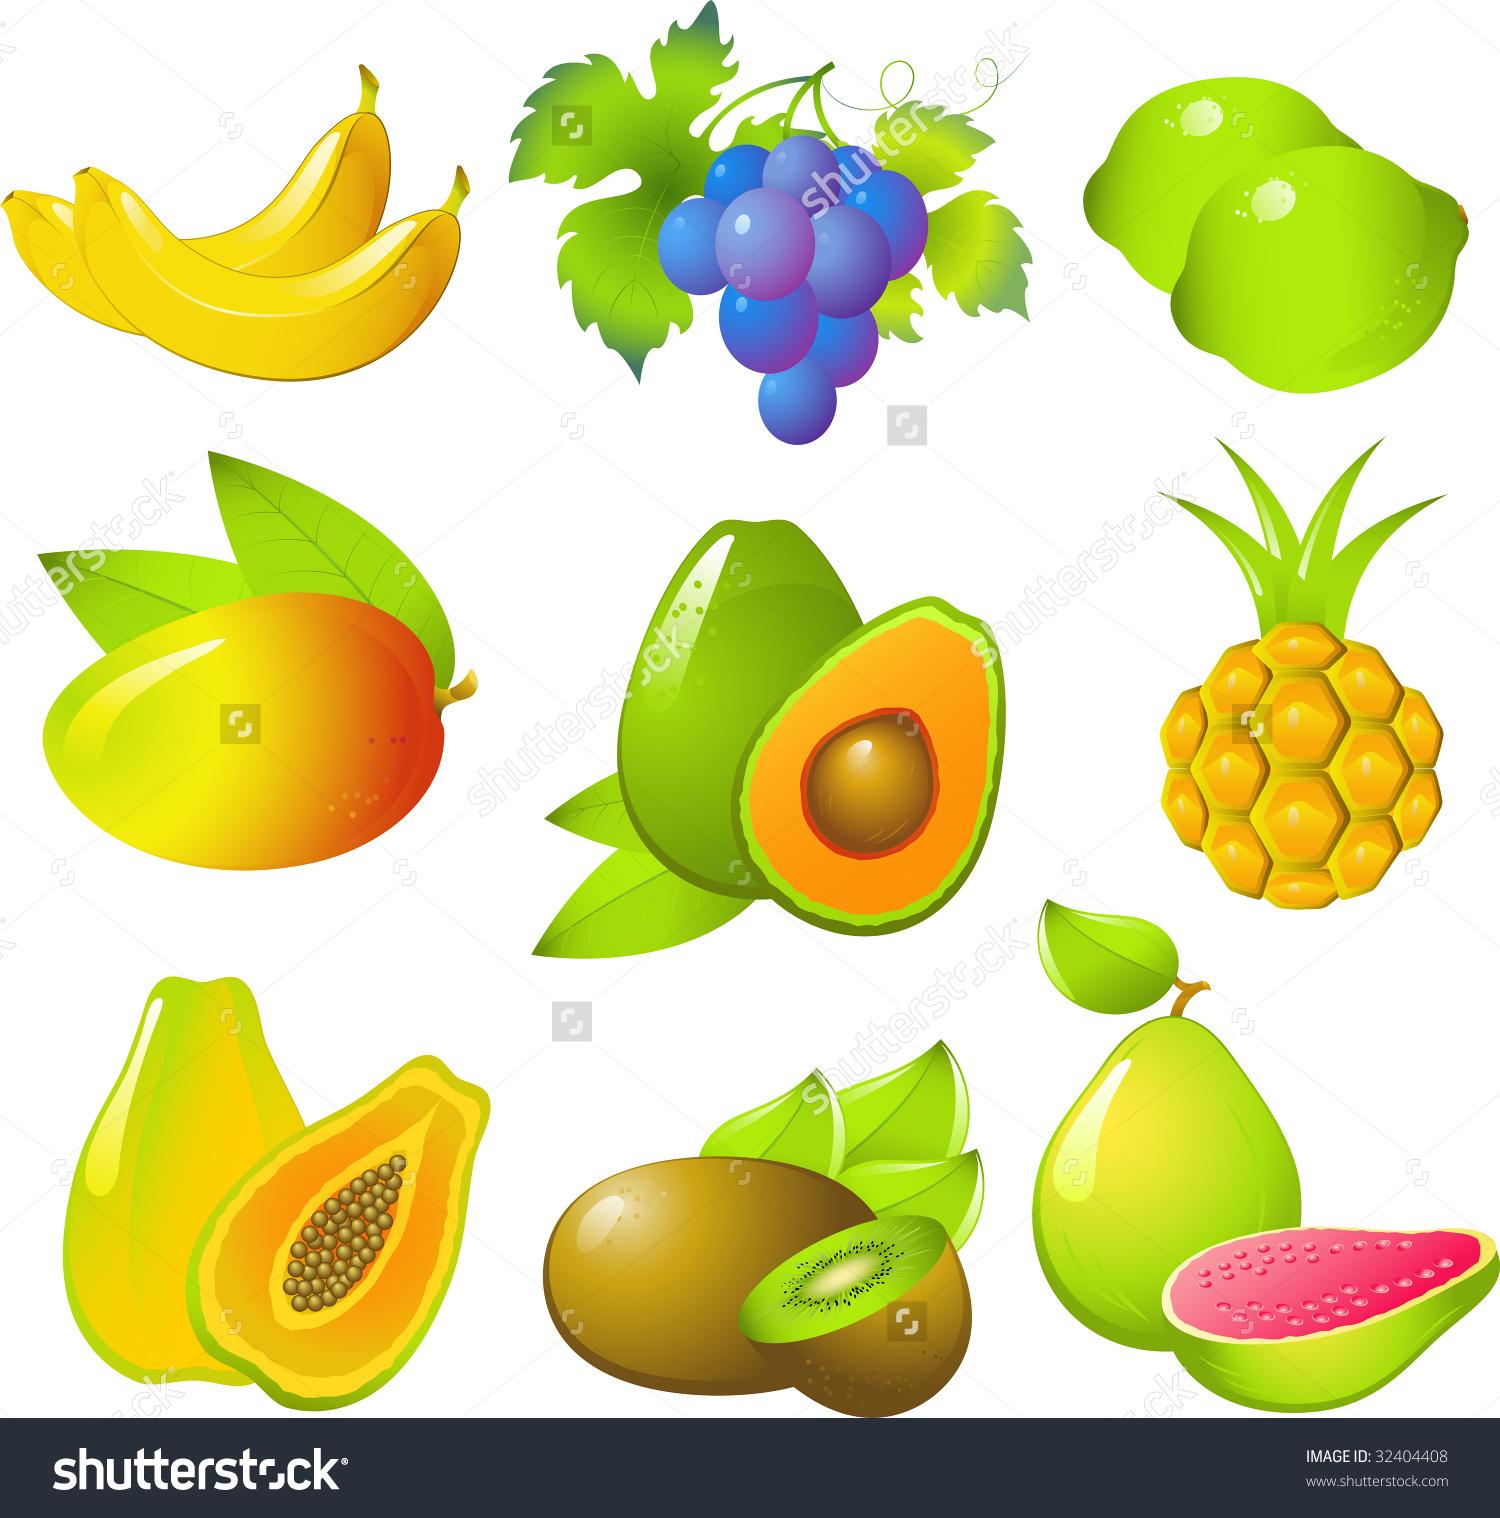 Vector Images Beautiful Exotic Fruits Bananas Stock Vector.